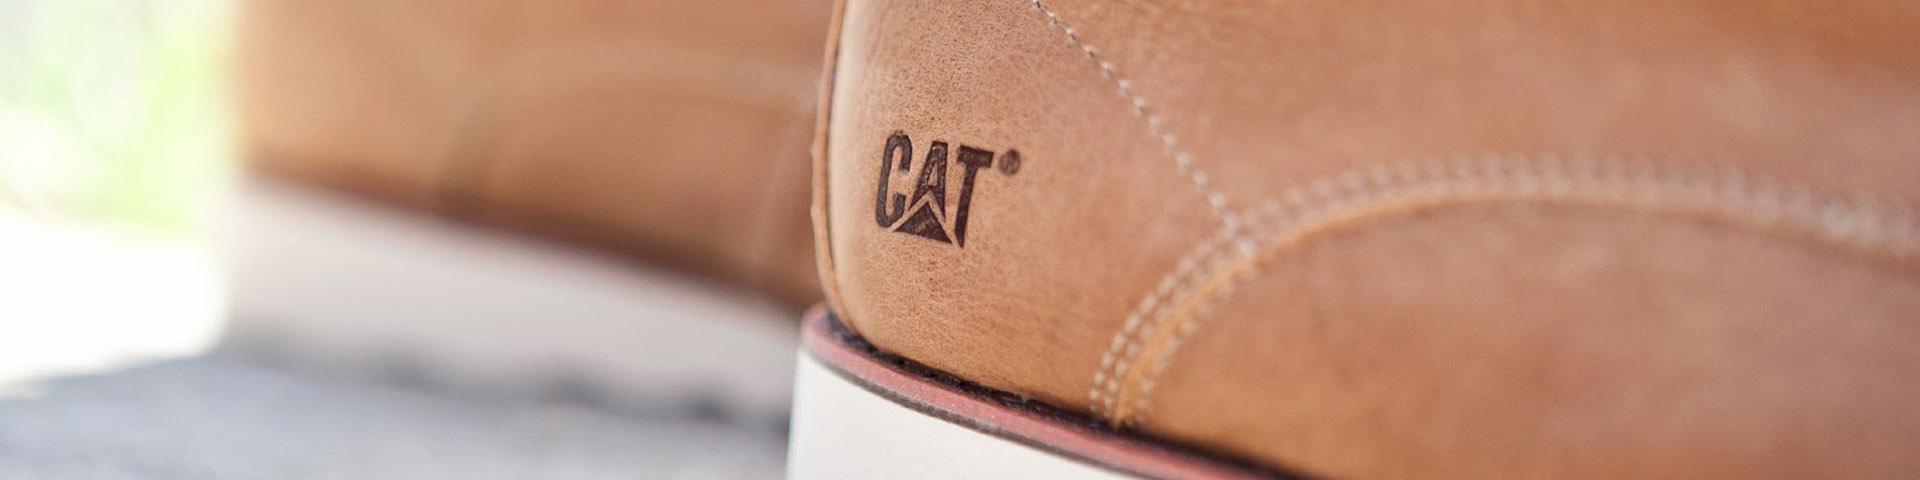 CAT_slider1920